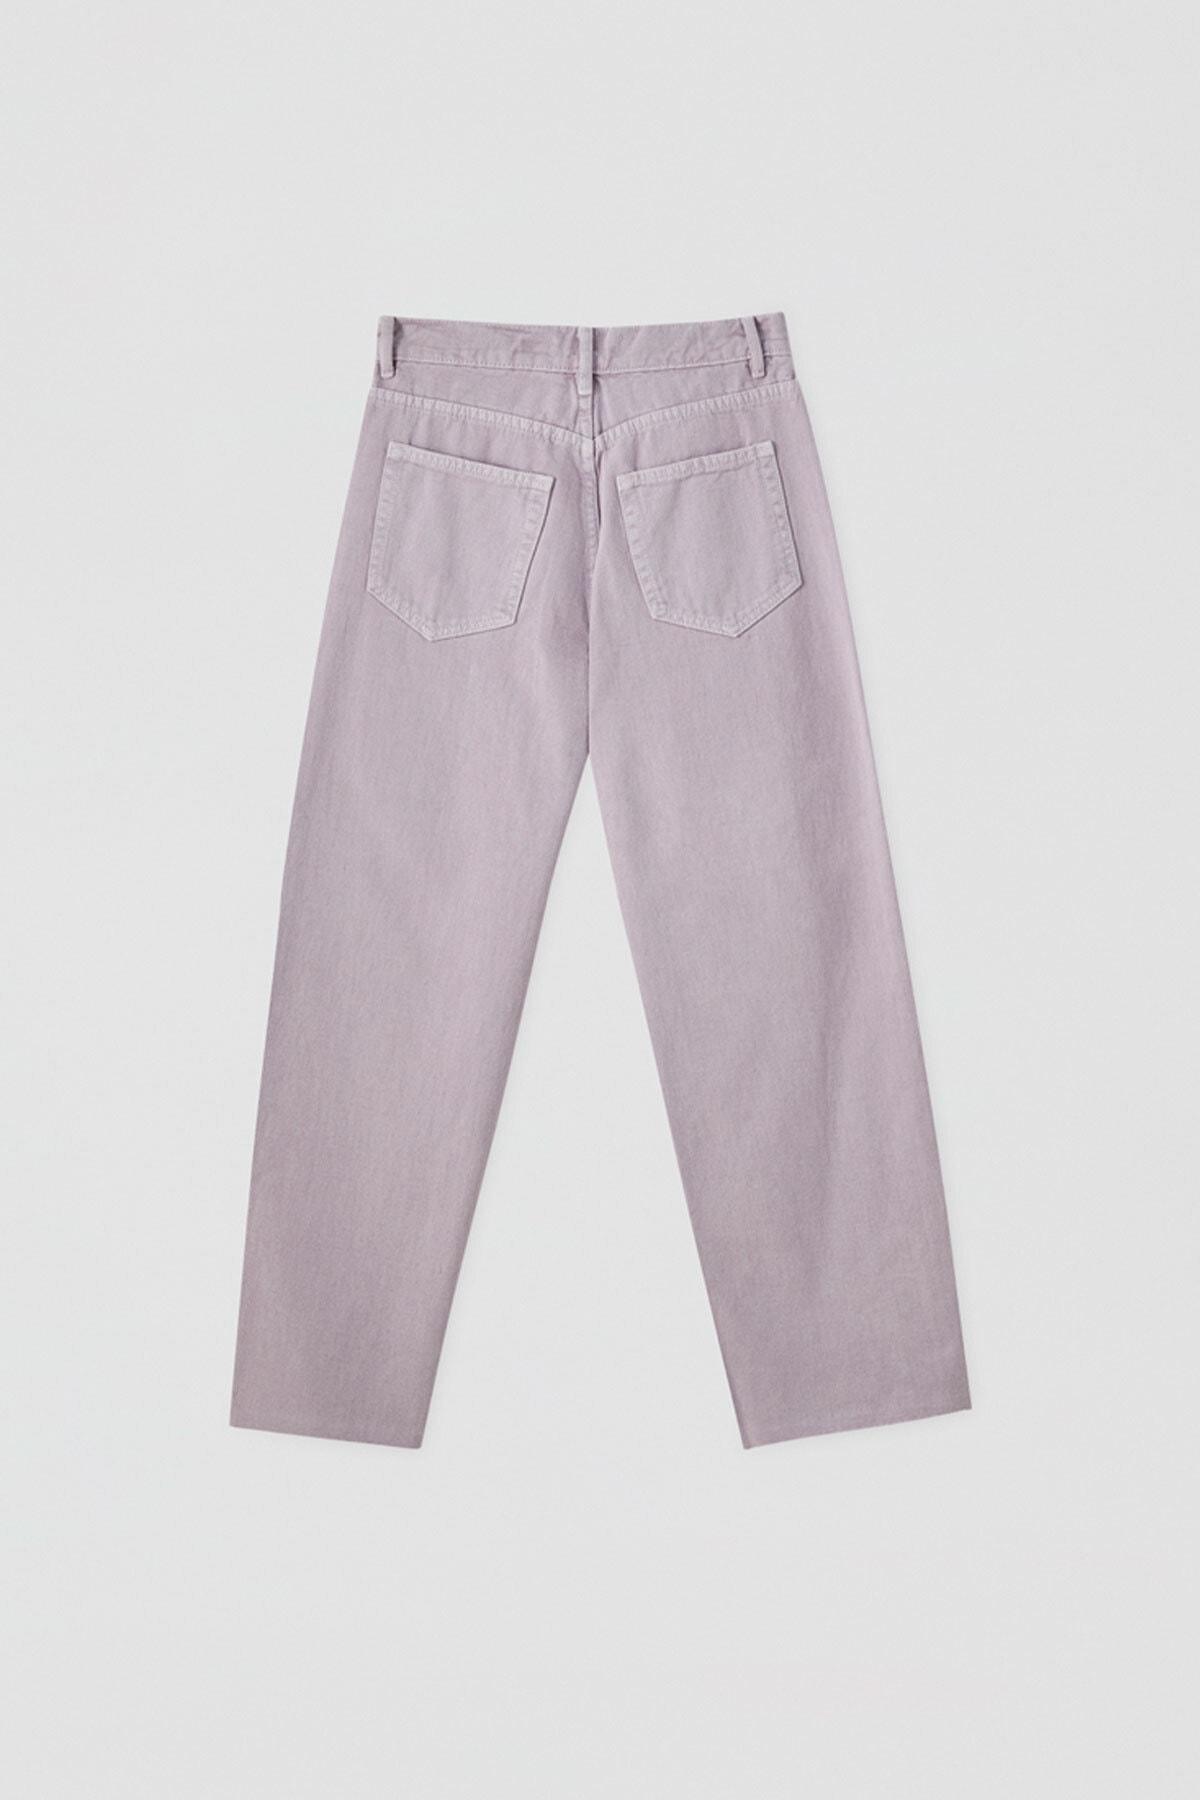 Pull & Bear Kadın Leylak Crop Straight Fit Jean 05670330 3